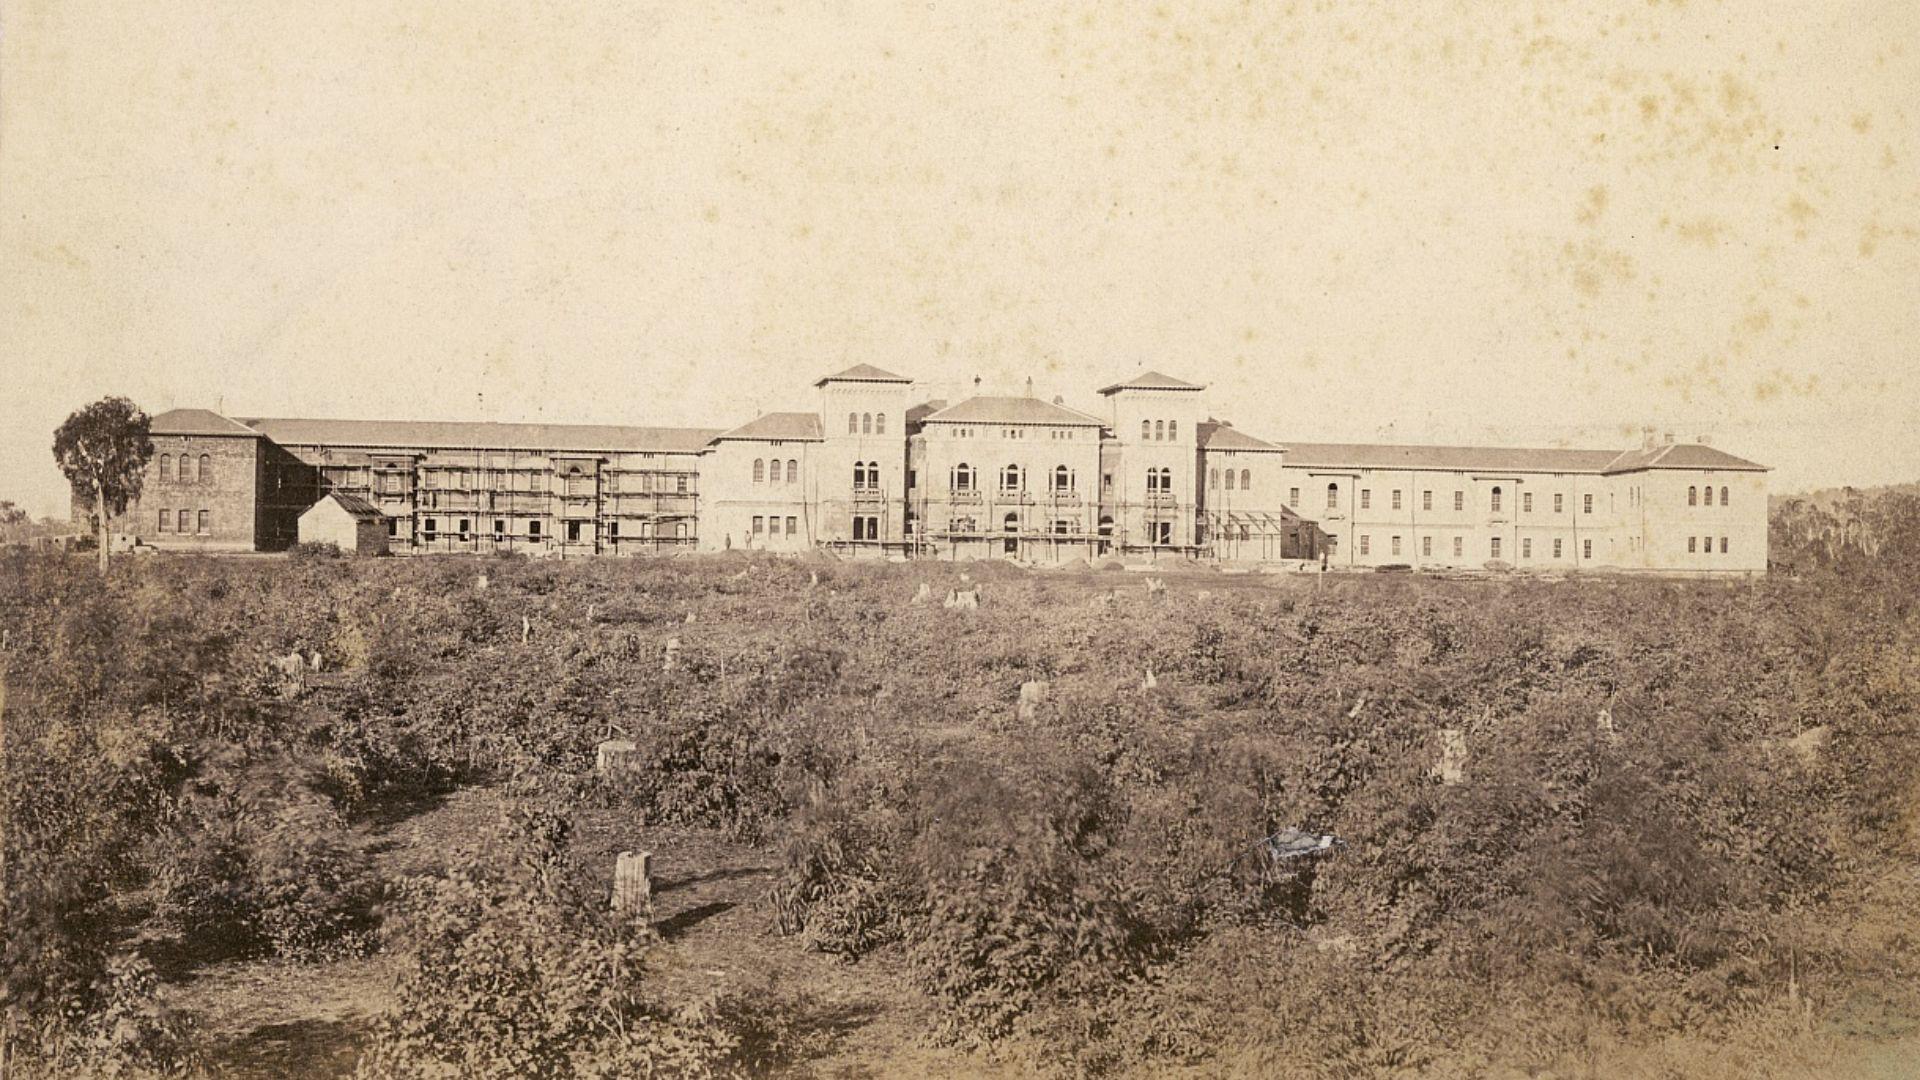 The historic lunatic asylum still relevant to regional Victoria today